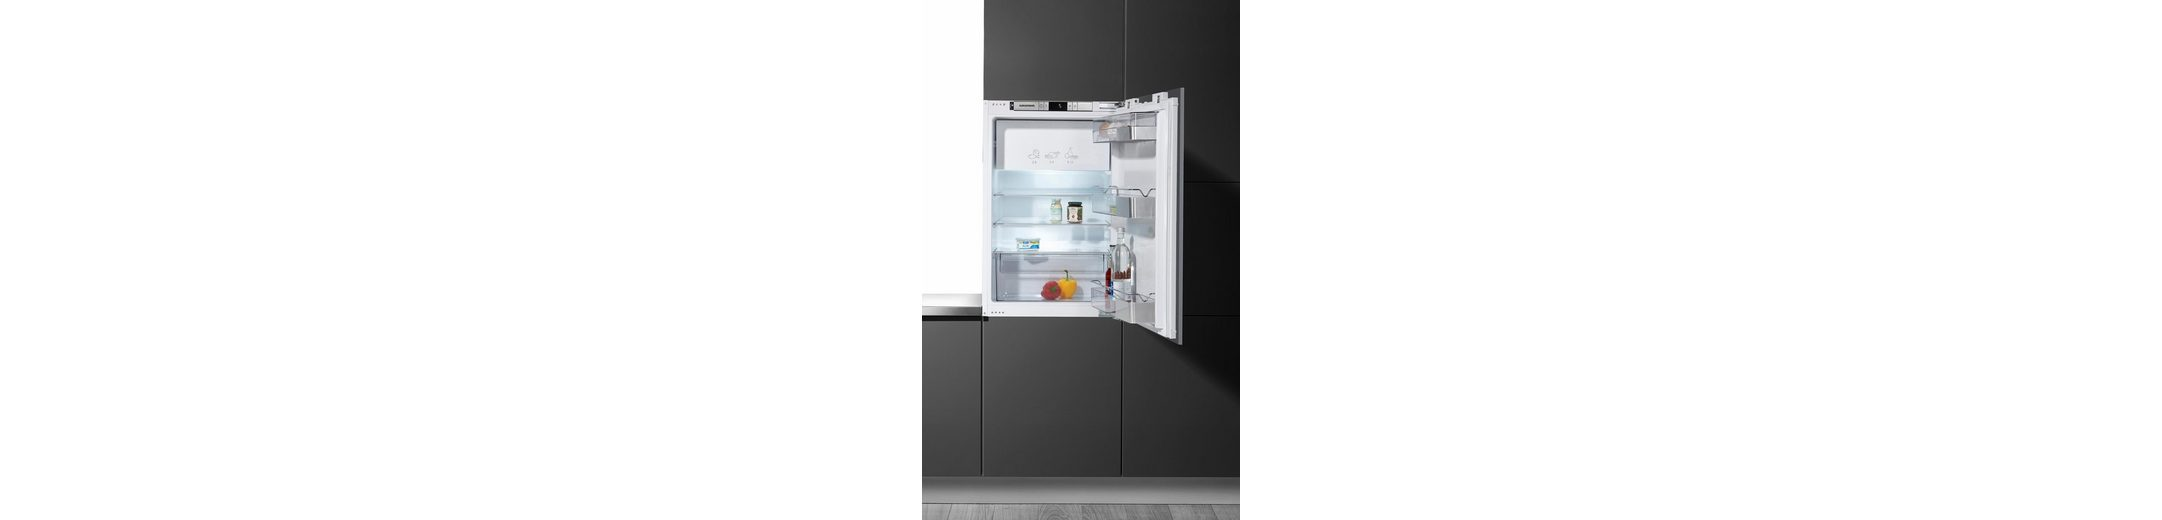 Grundig integrierbarer Einbaukühlschrank GTMI 14120, A++, 87,7 cm